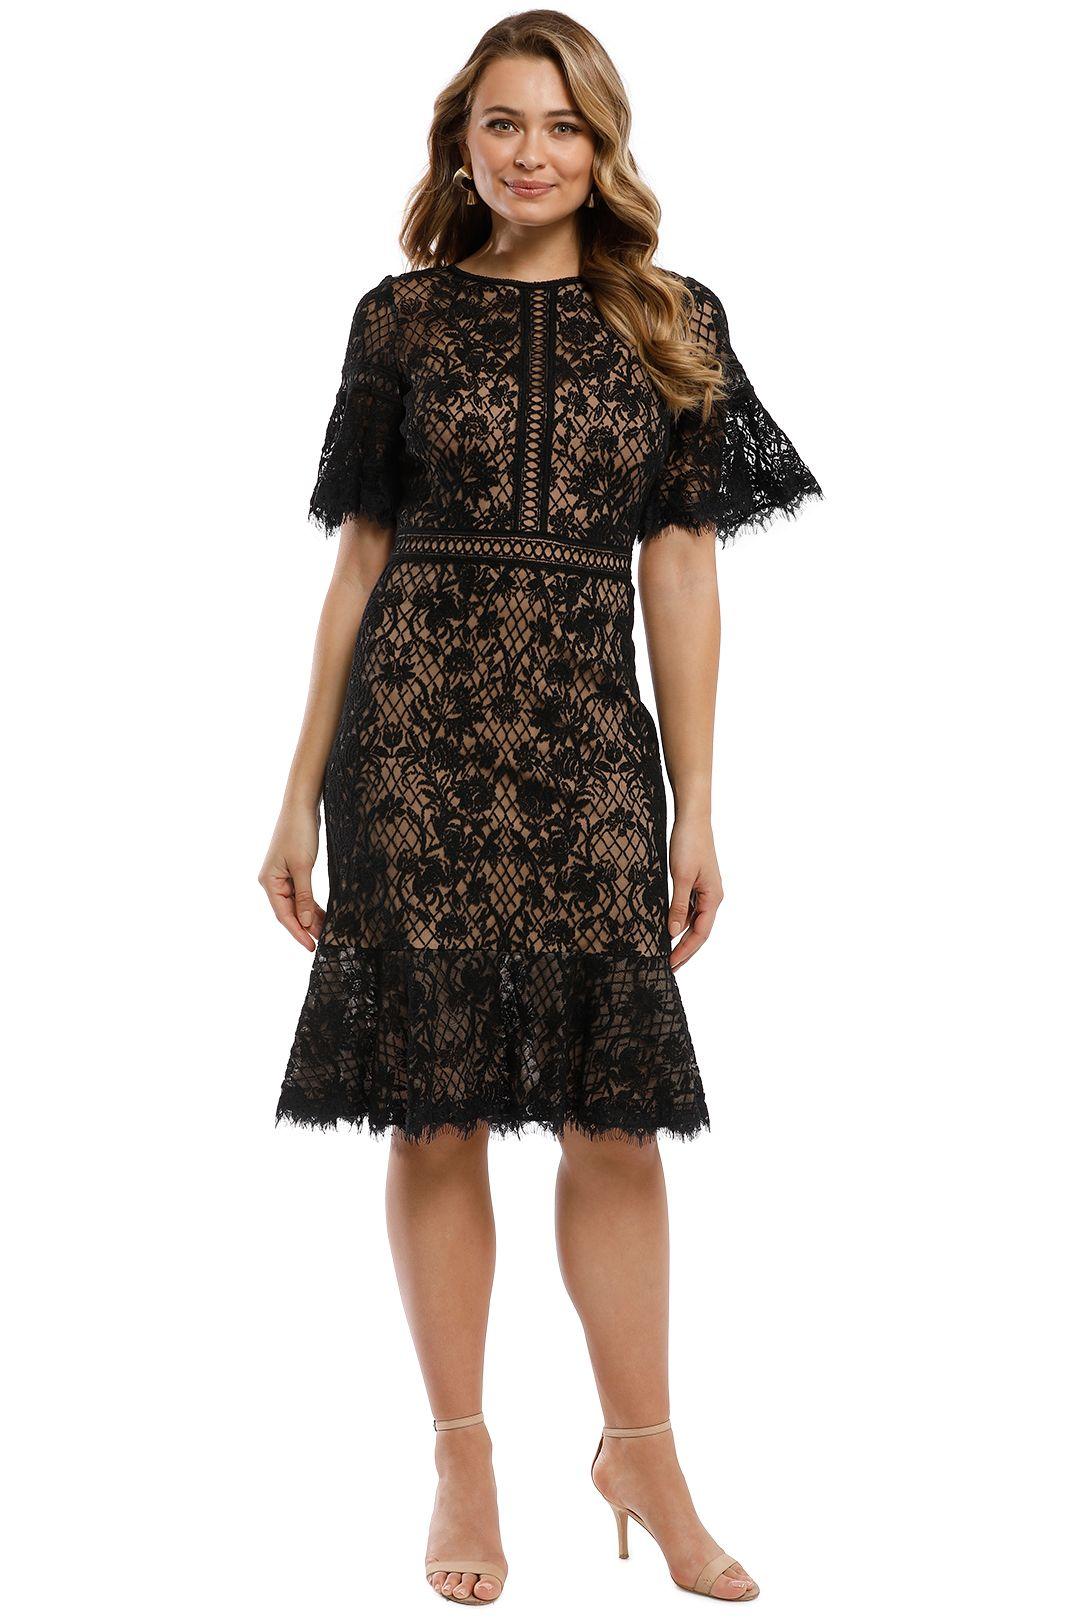 Tadashi Shoji - Mirabelle Embroidered Dress - Black - Front